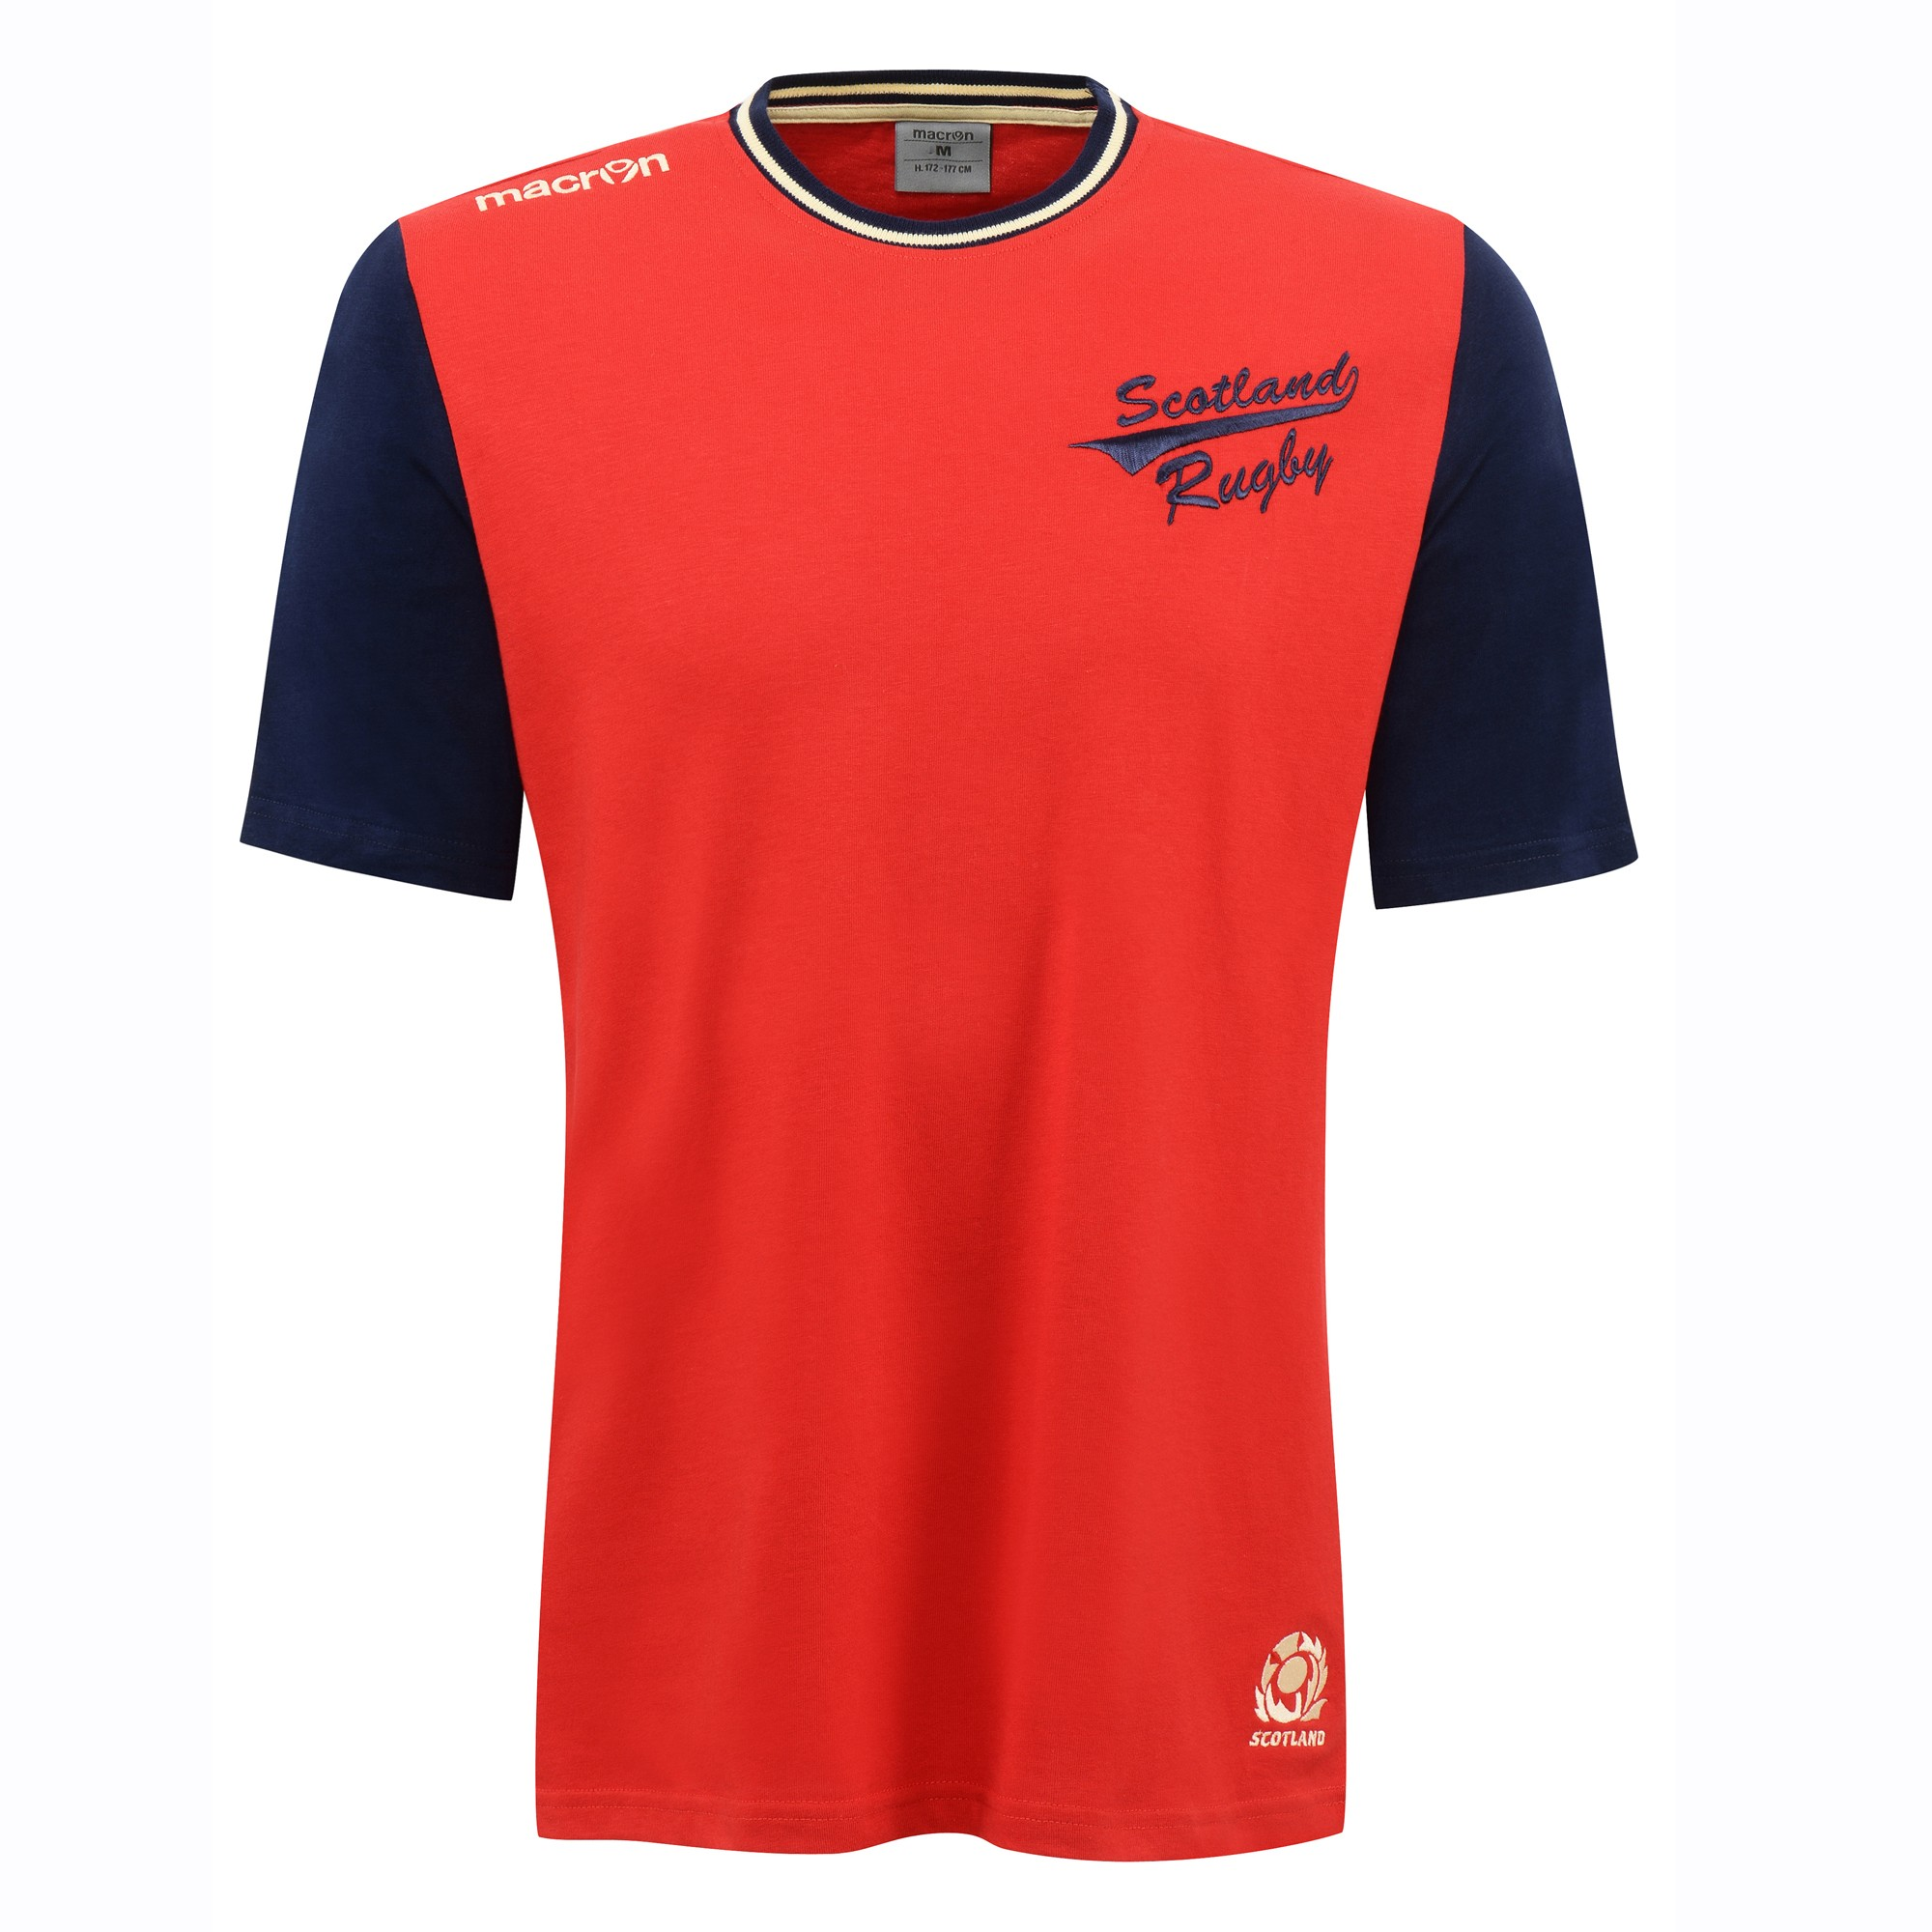 2016-2017 Scotland Macron Travel Cotton T-Shirt (Red)